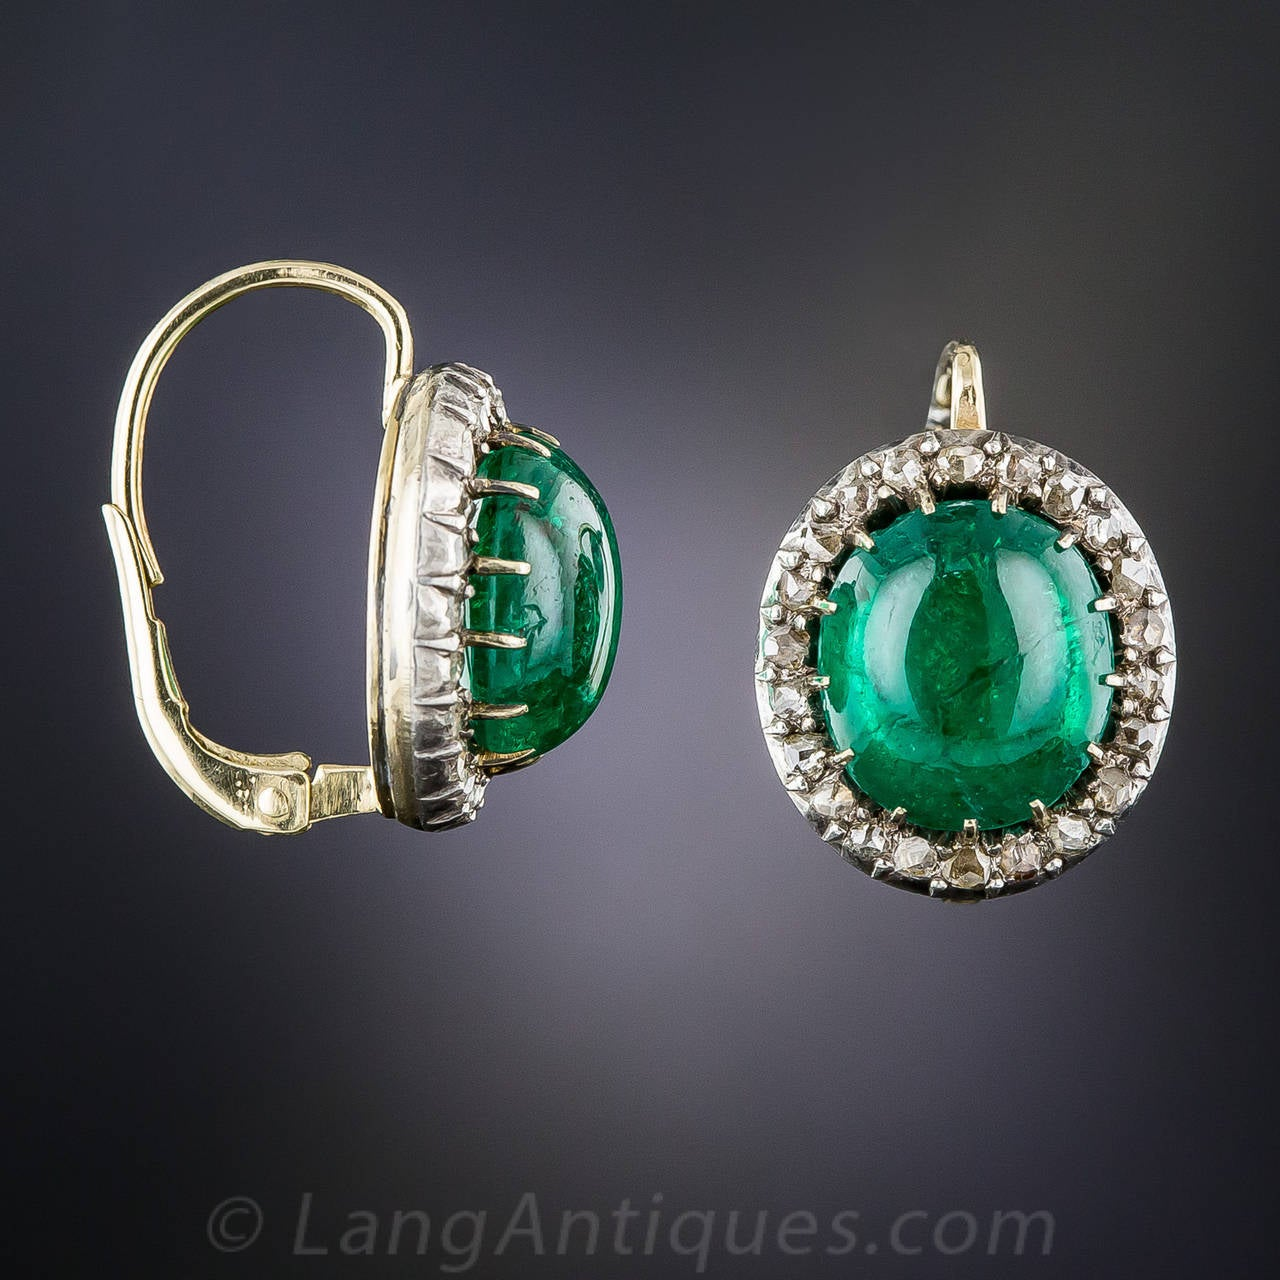 Antique 8 00 Carat Cabochon Emerald Rose Cut Diamond